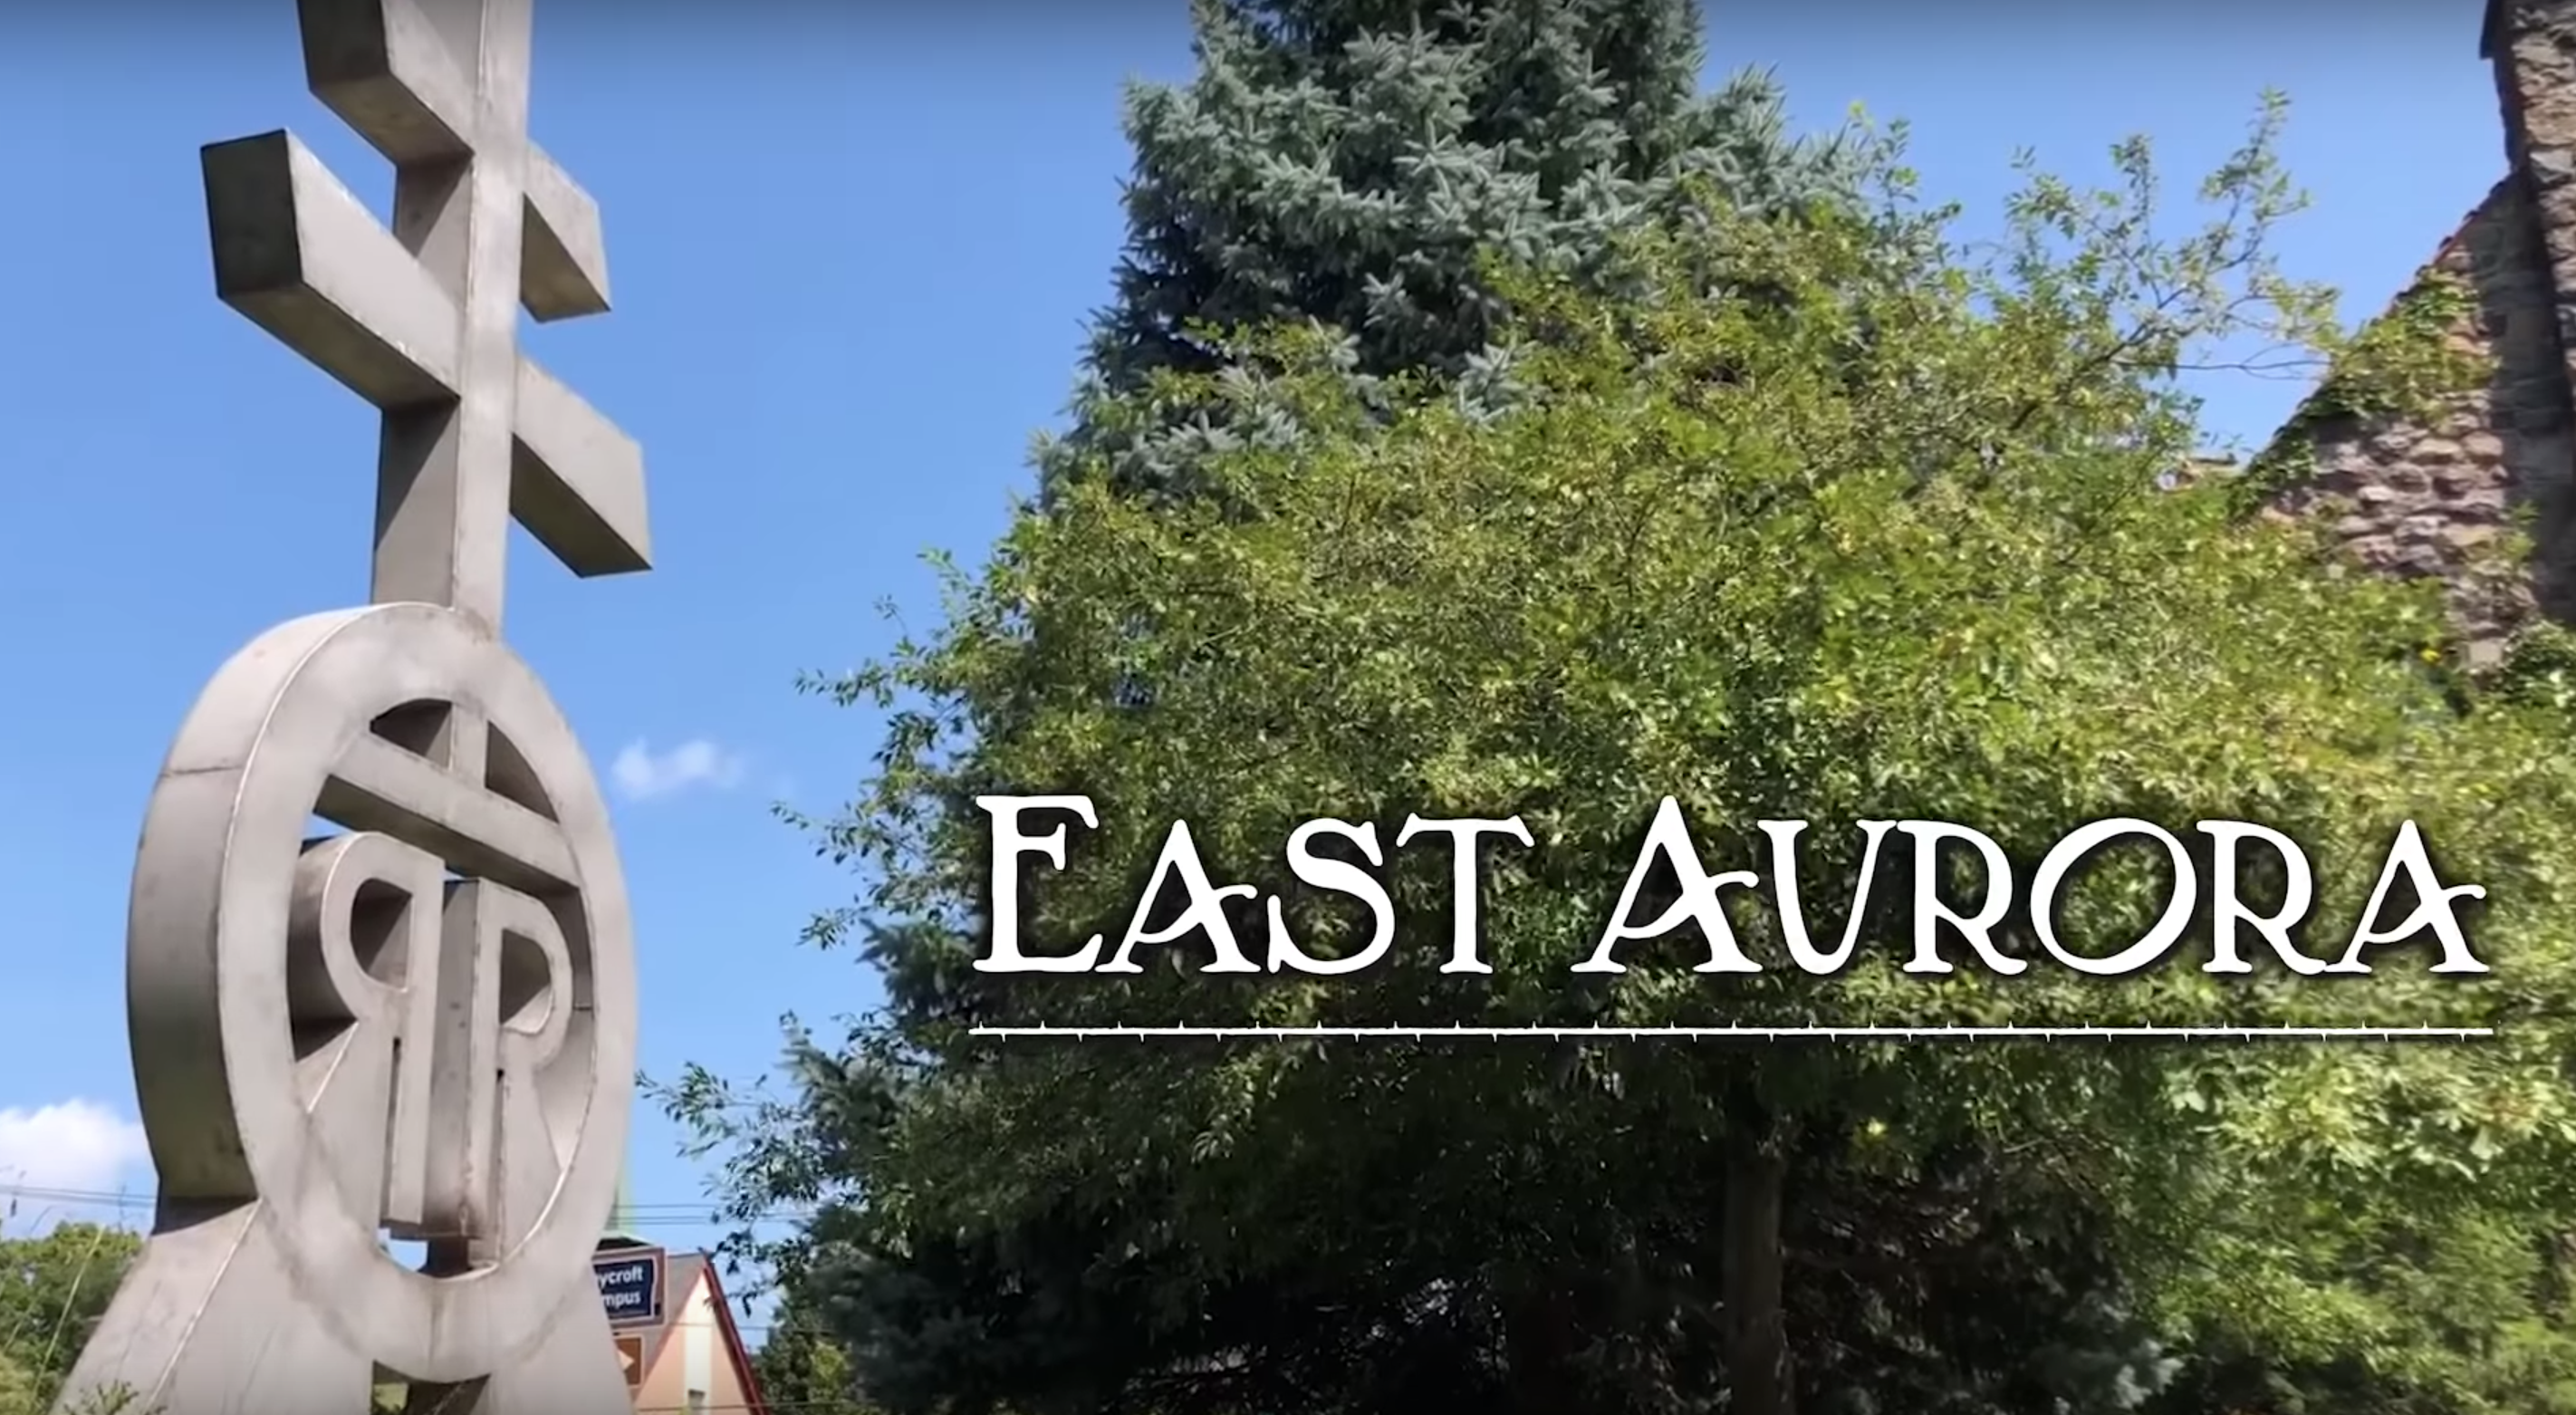 East Aurora: A Well Designed Destination photo